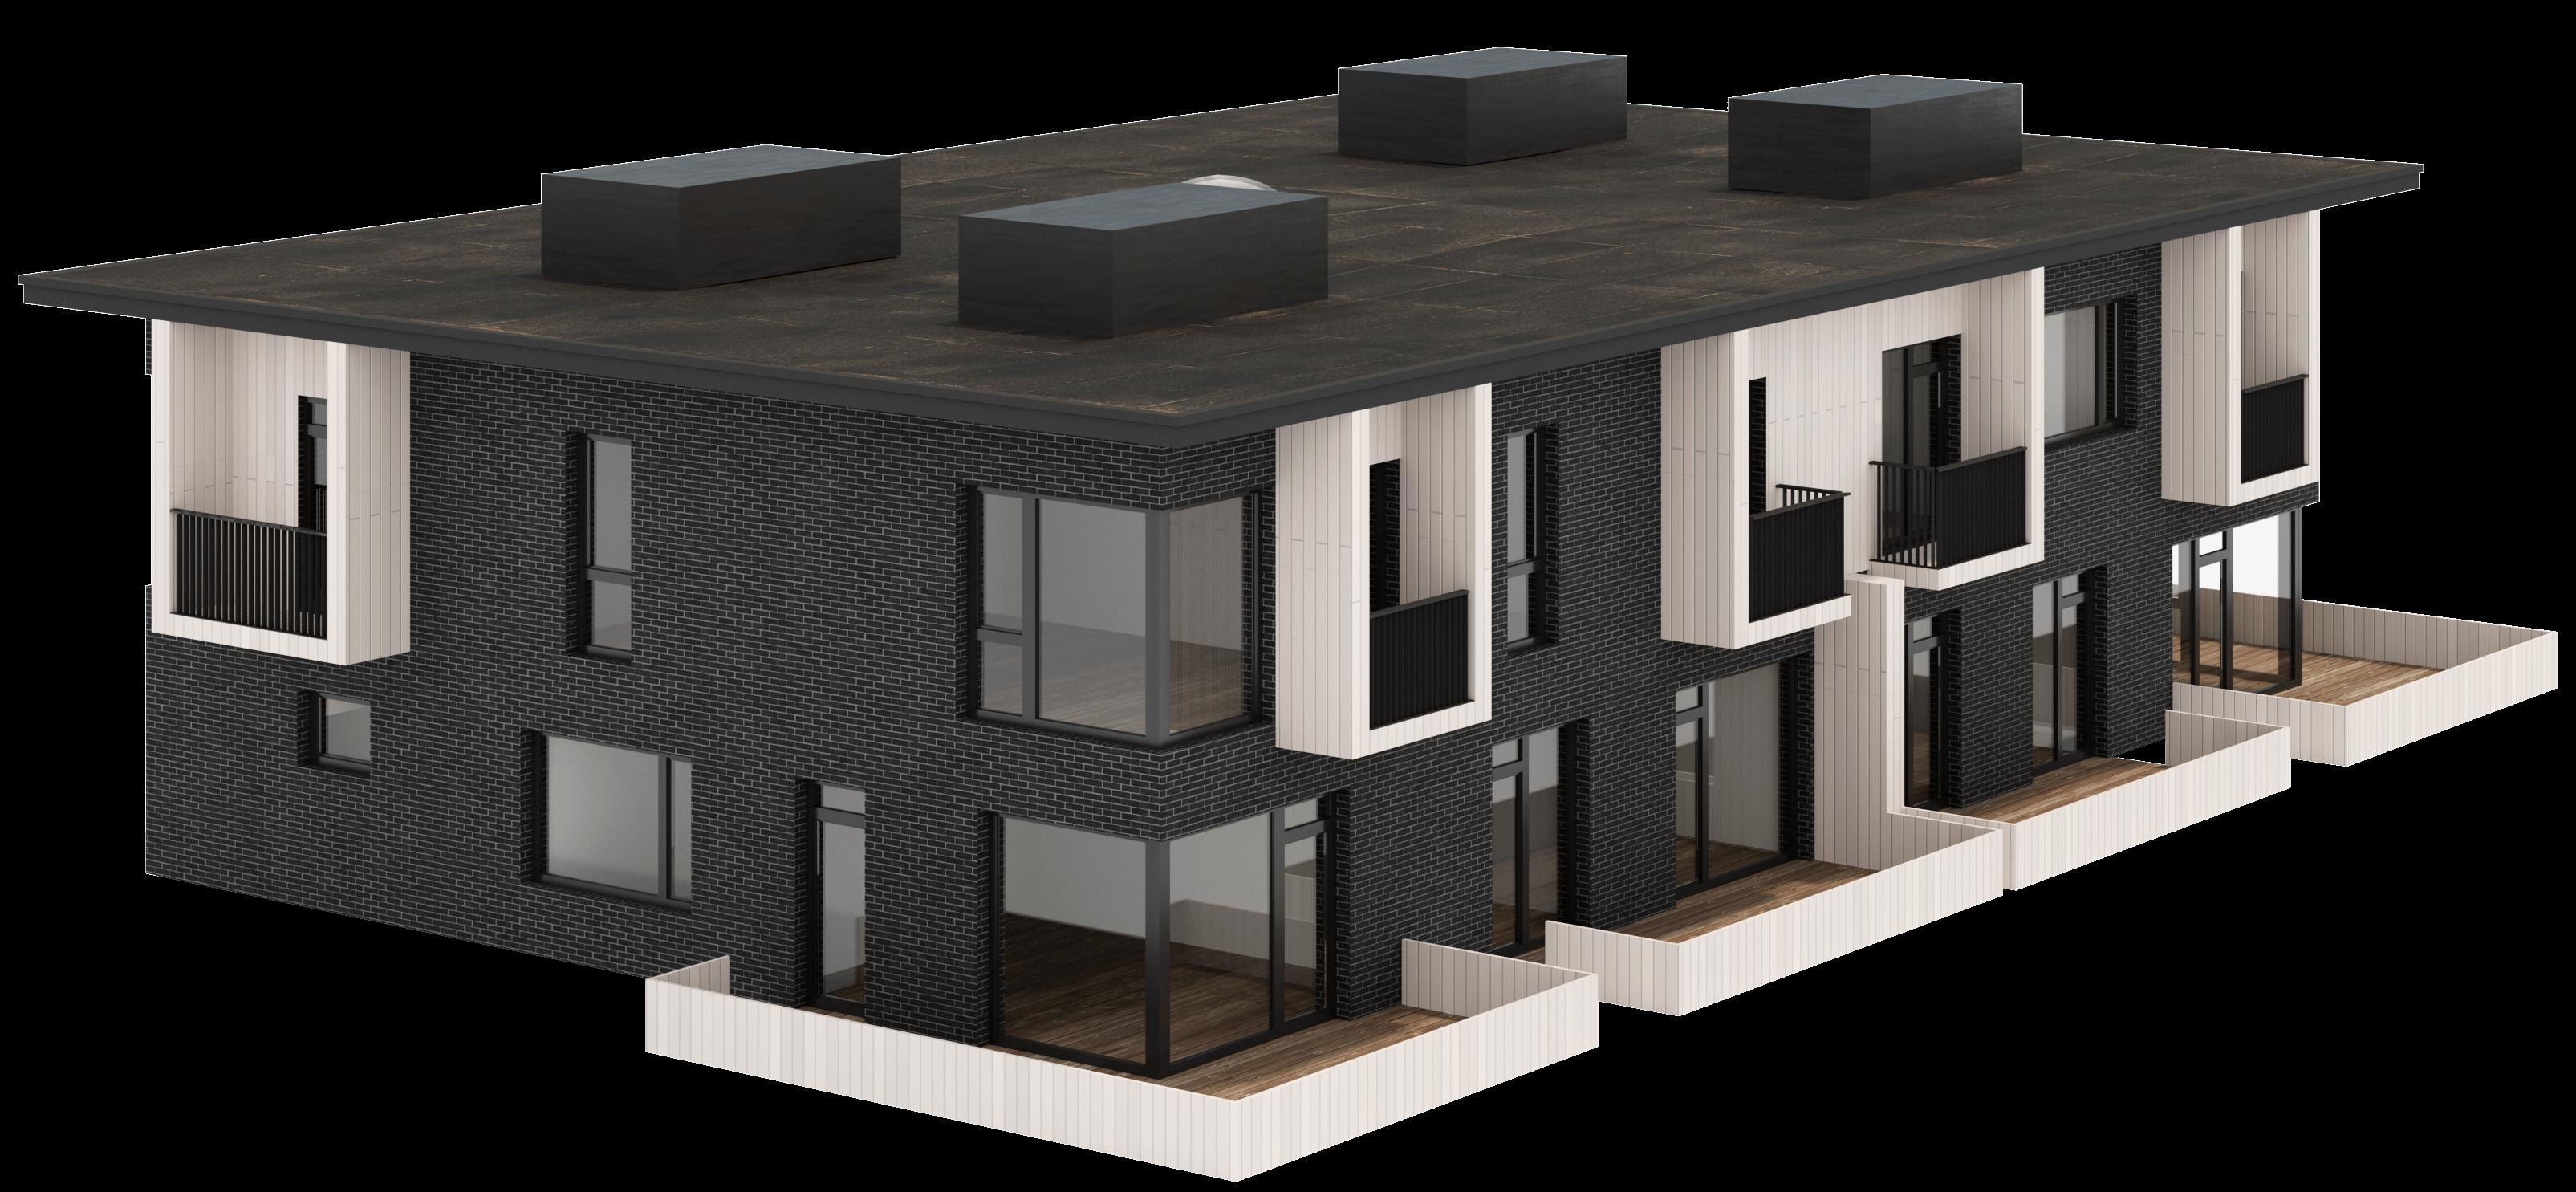 House Image 3